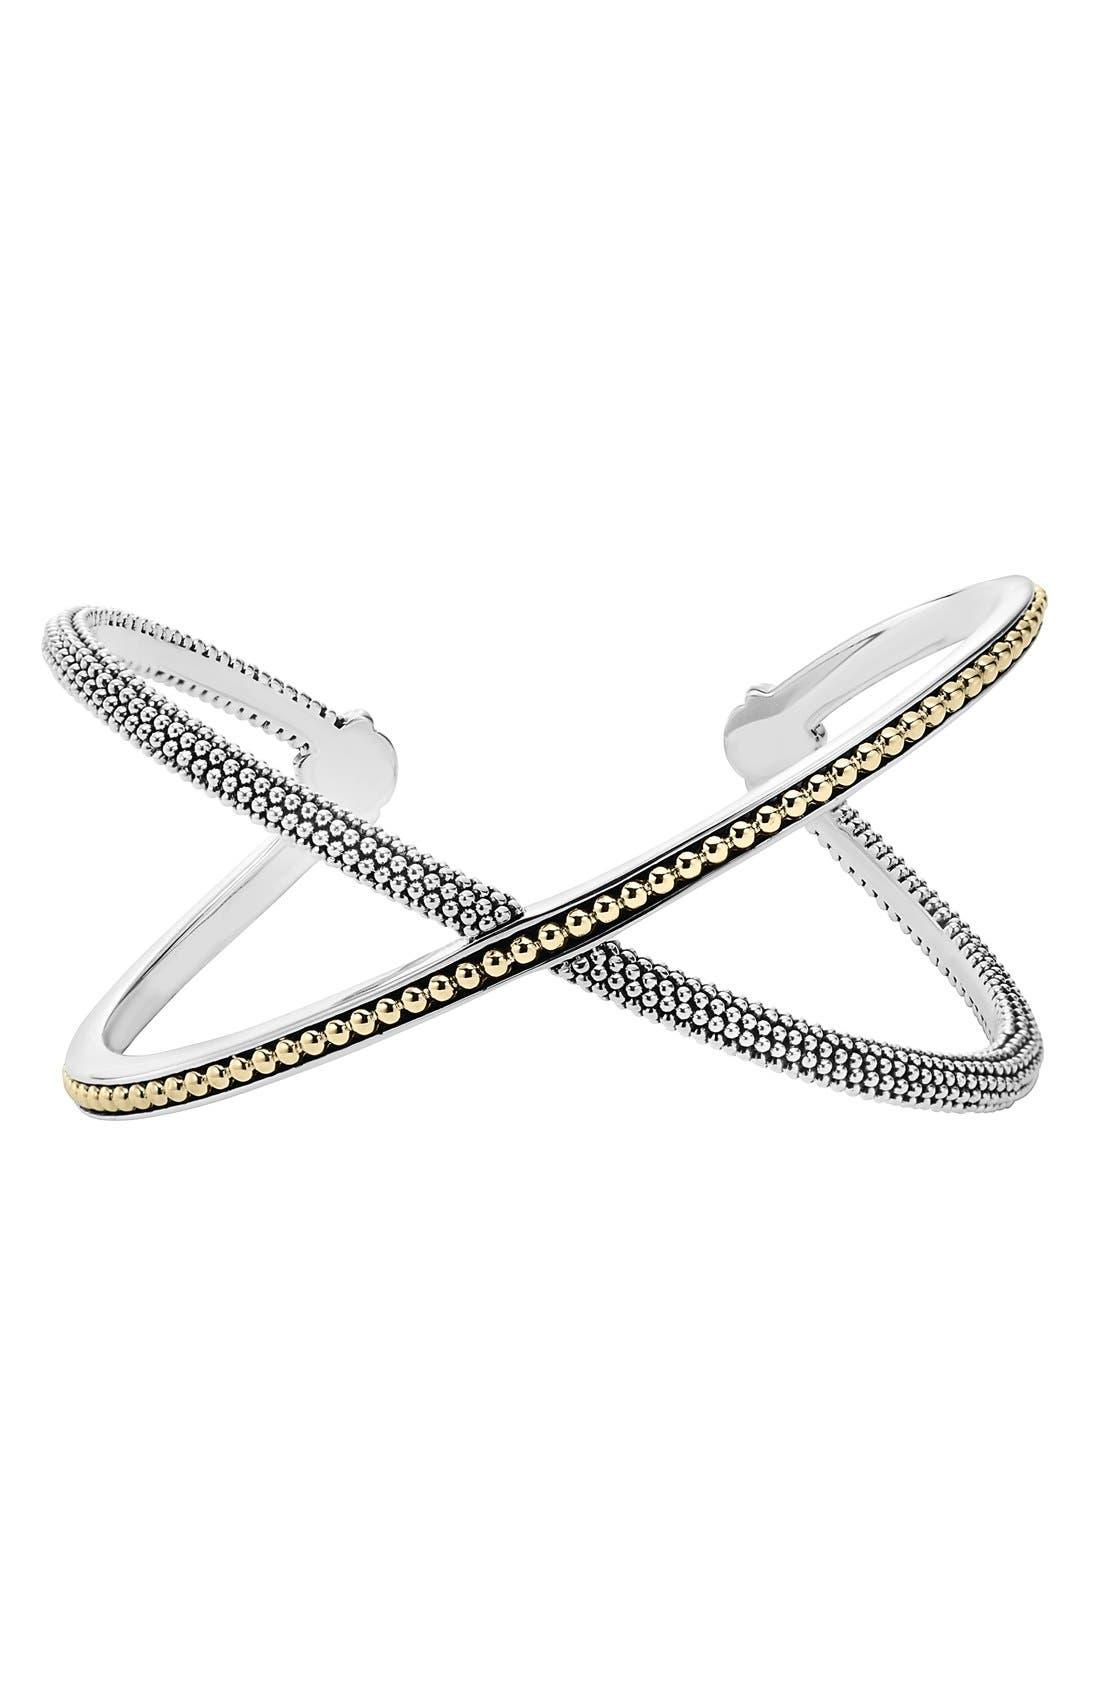 LAGOS Infinity Cuff Bracelet